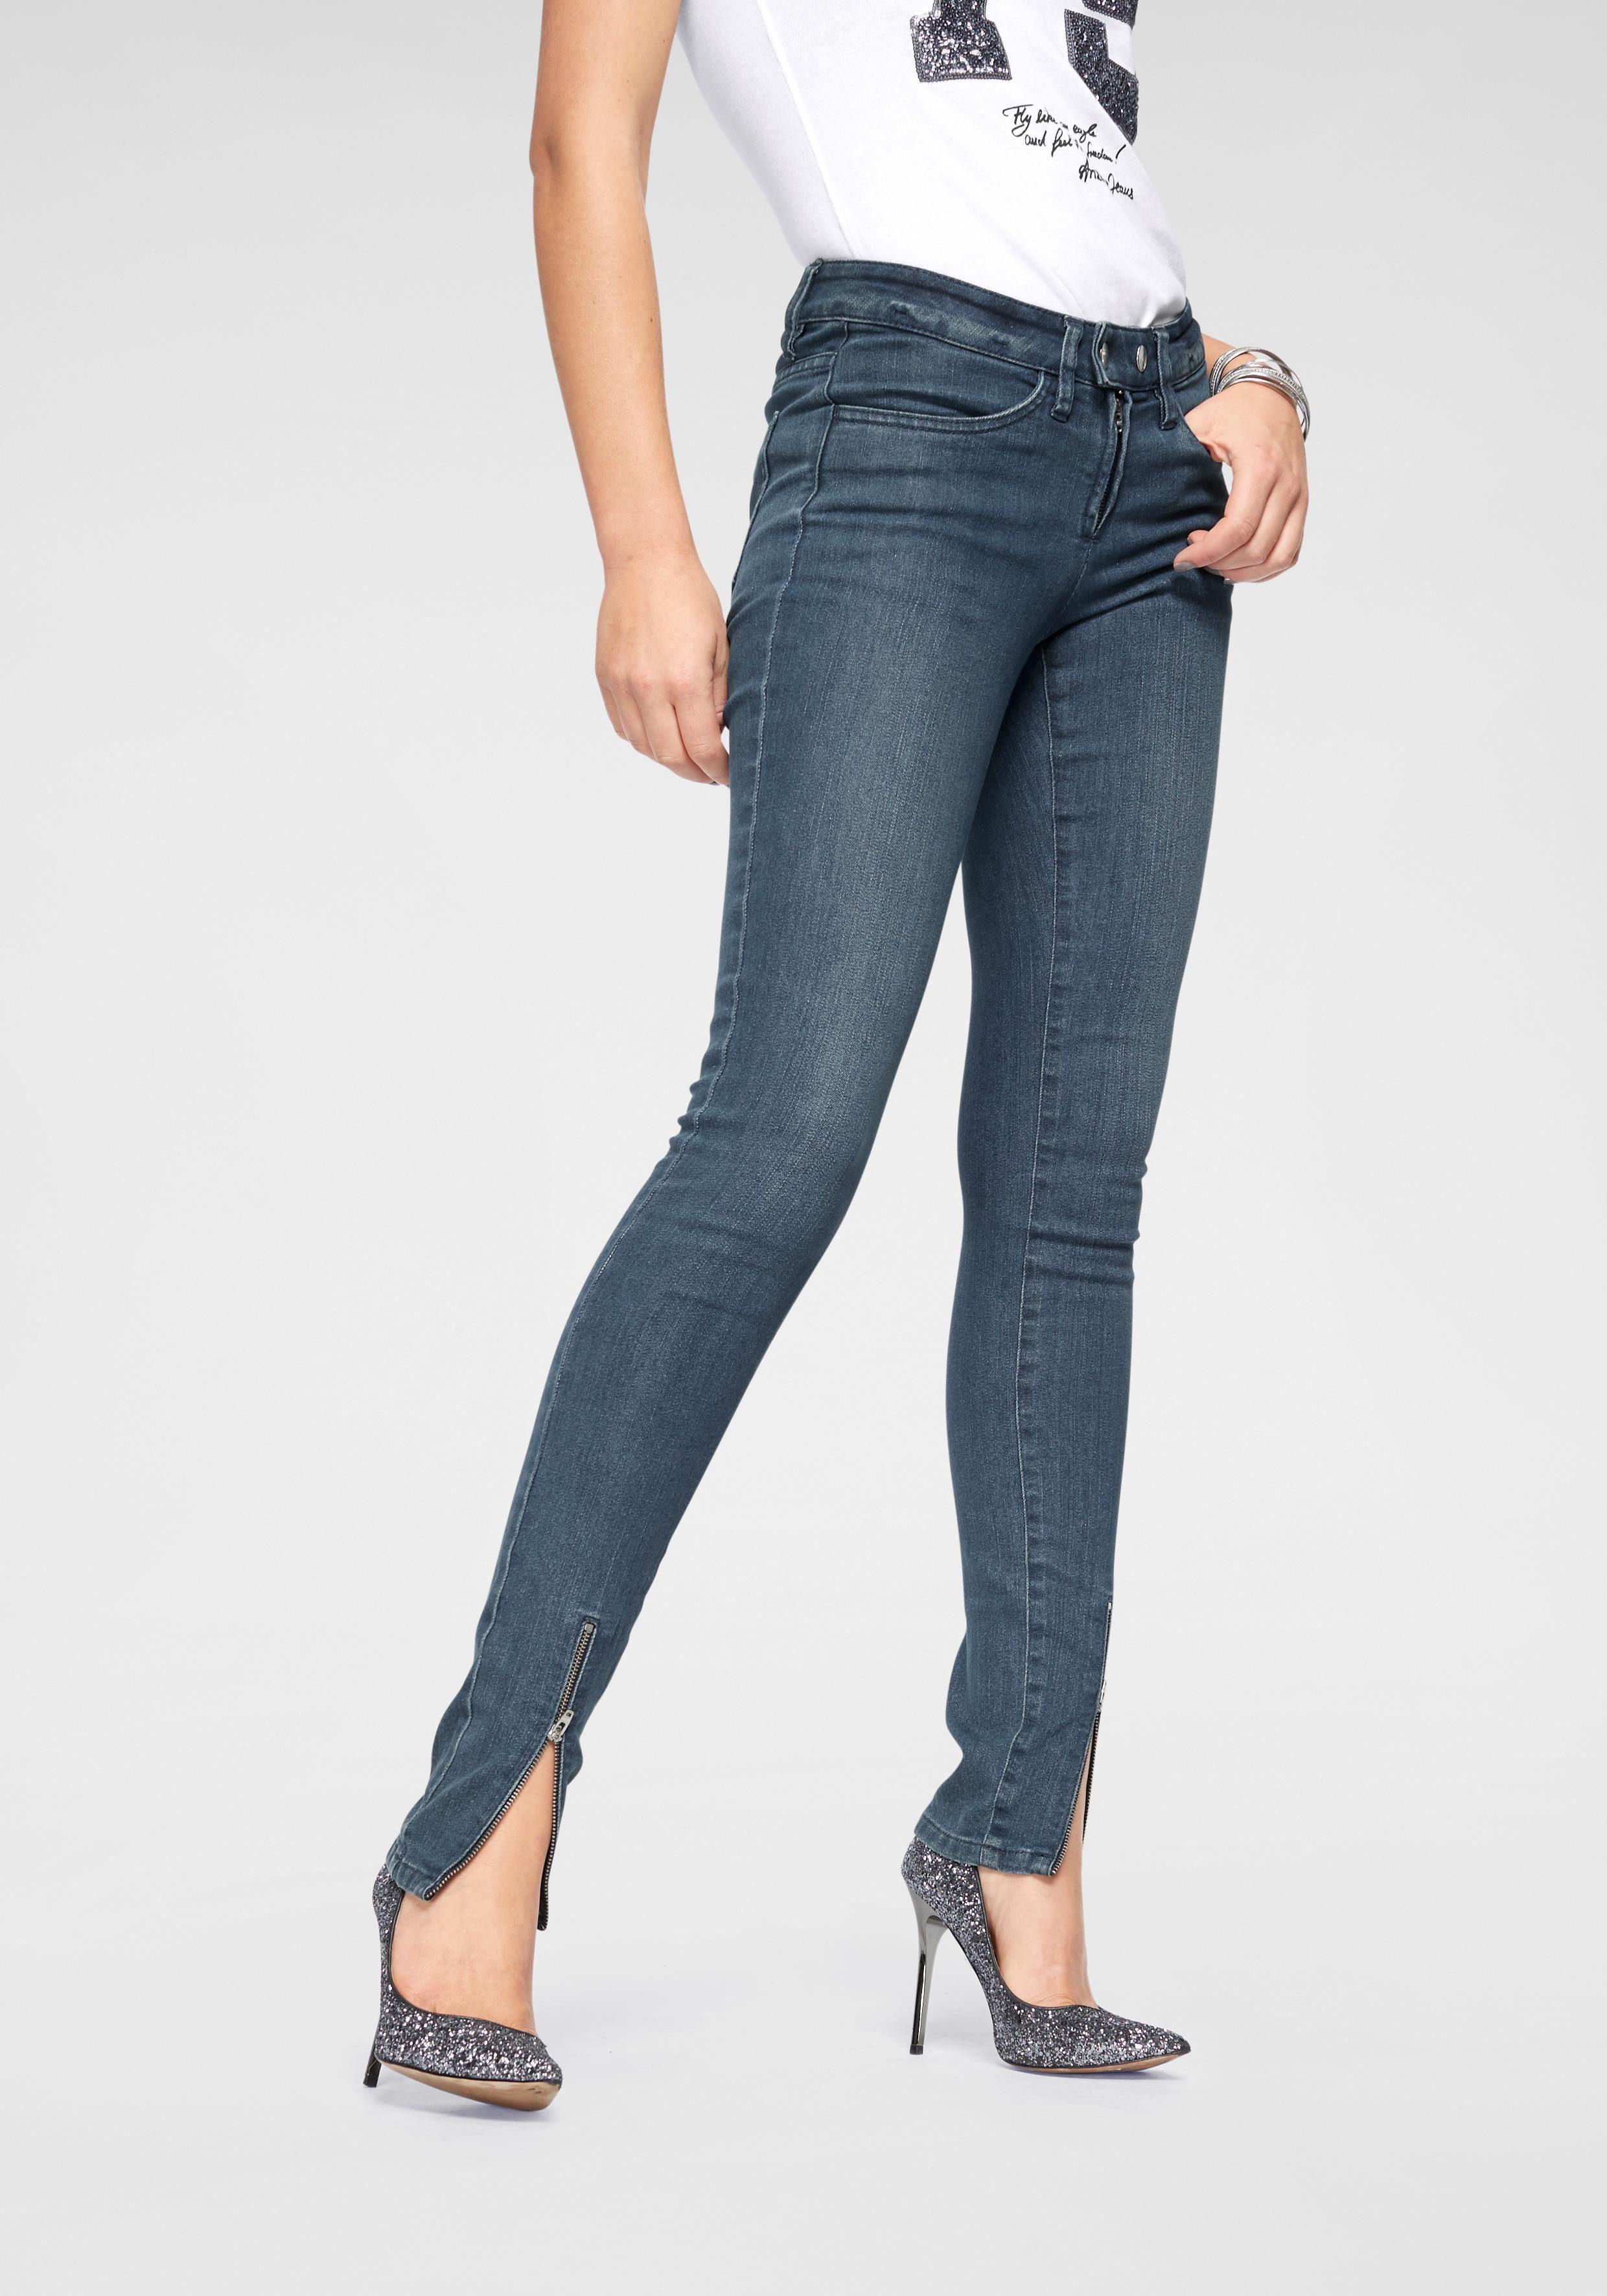 Jeans ♥ WOW NEU ESPRIT DAMEN FLARE MEDIUM RISE DENIM JEANS